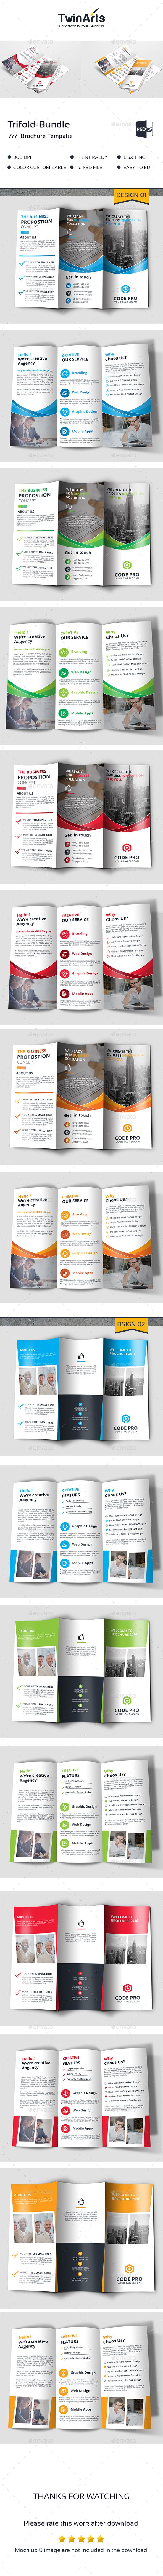 Trifold Brochures Print Template PSD Bundle